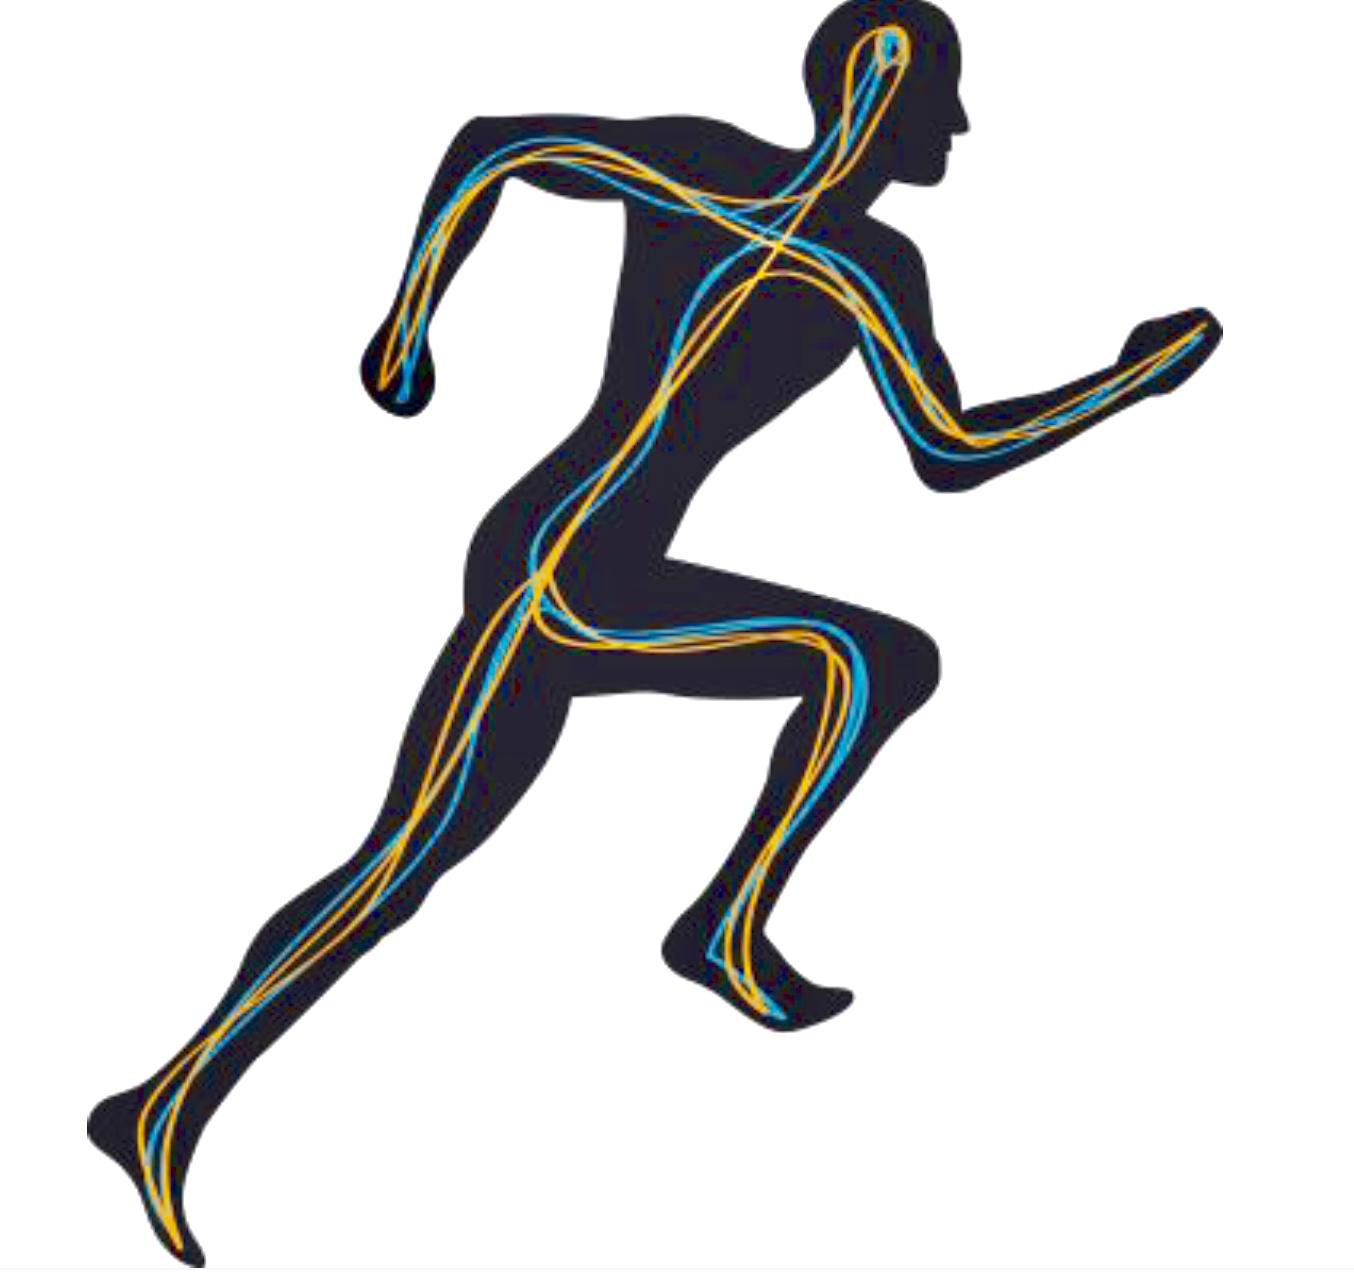 1354x1274 Run Fundamentals Posture Breathing Leapfrog Track Practice